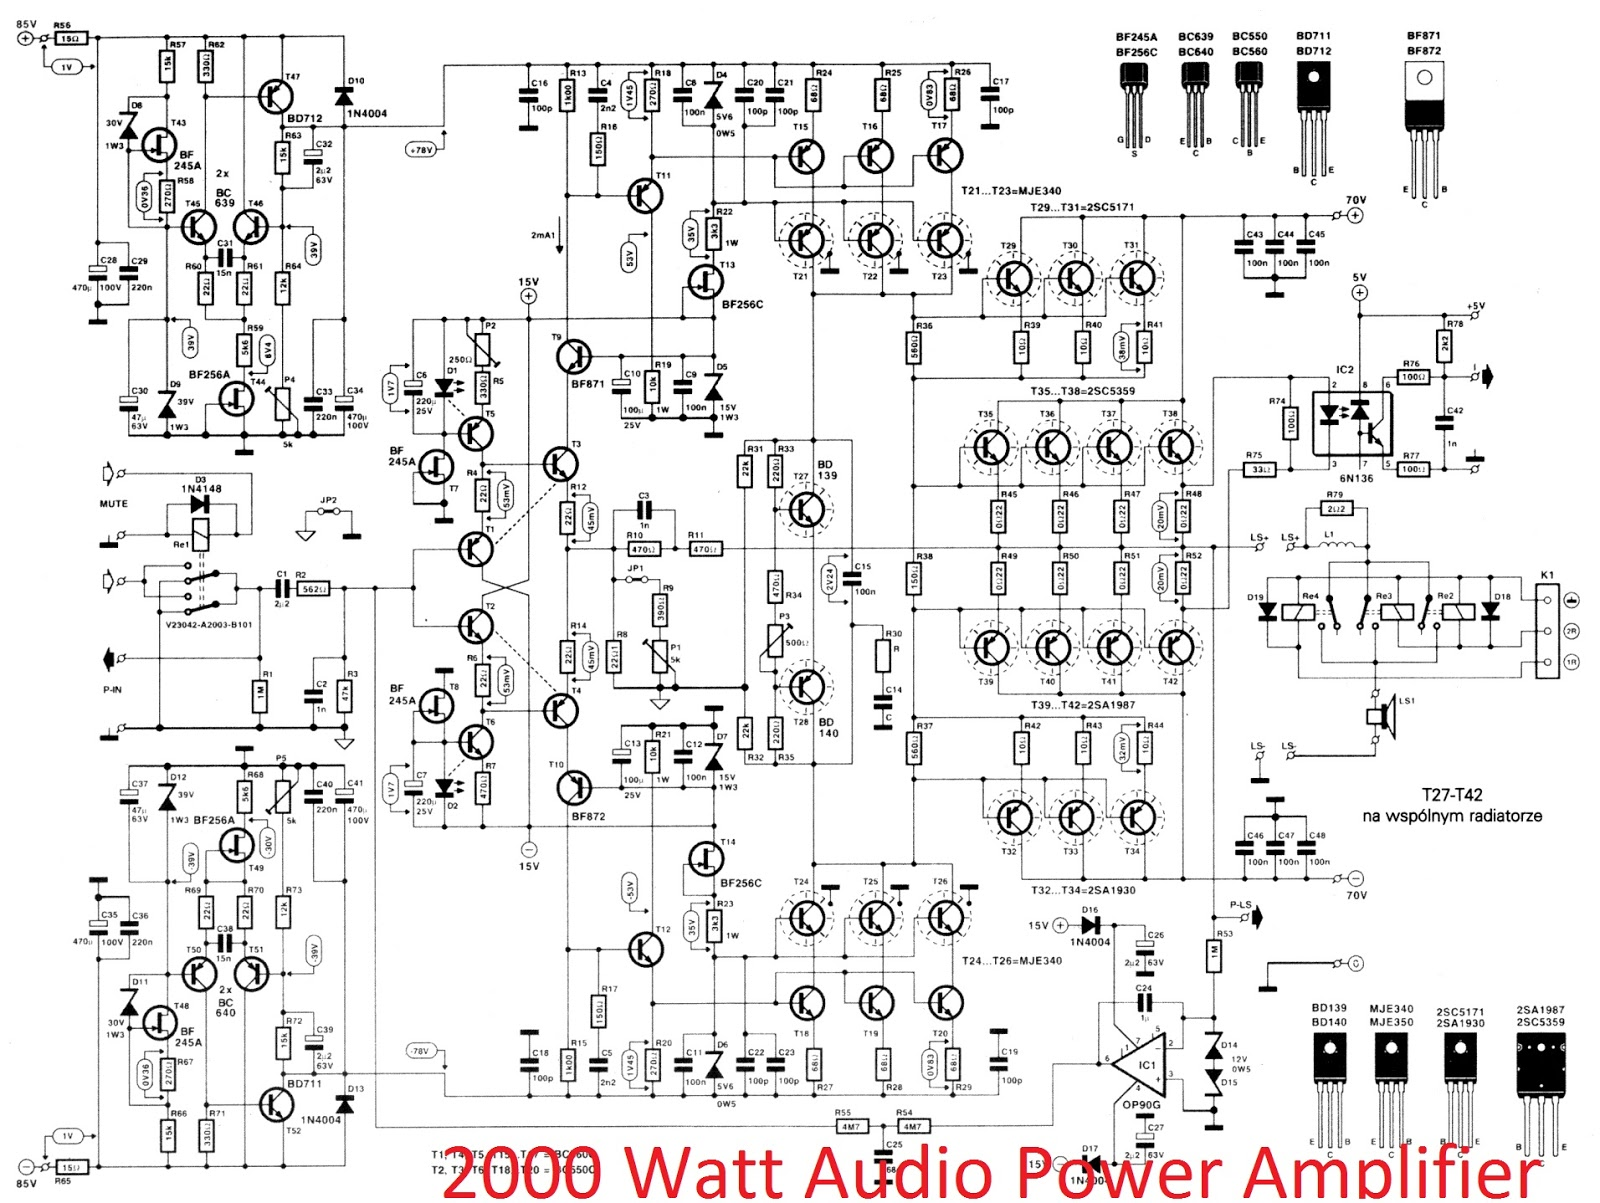 5000 watt amplifier circuit diagram electrical junction box wiring inverter and